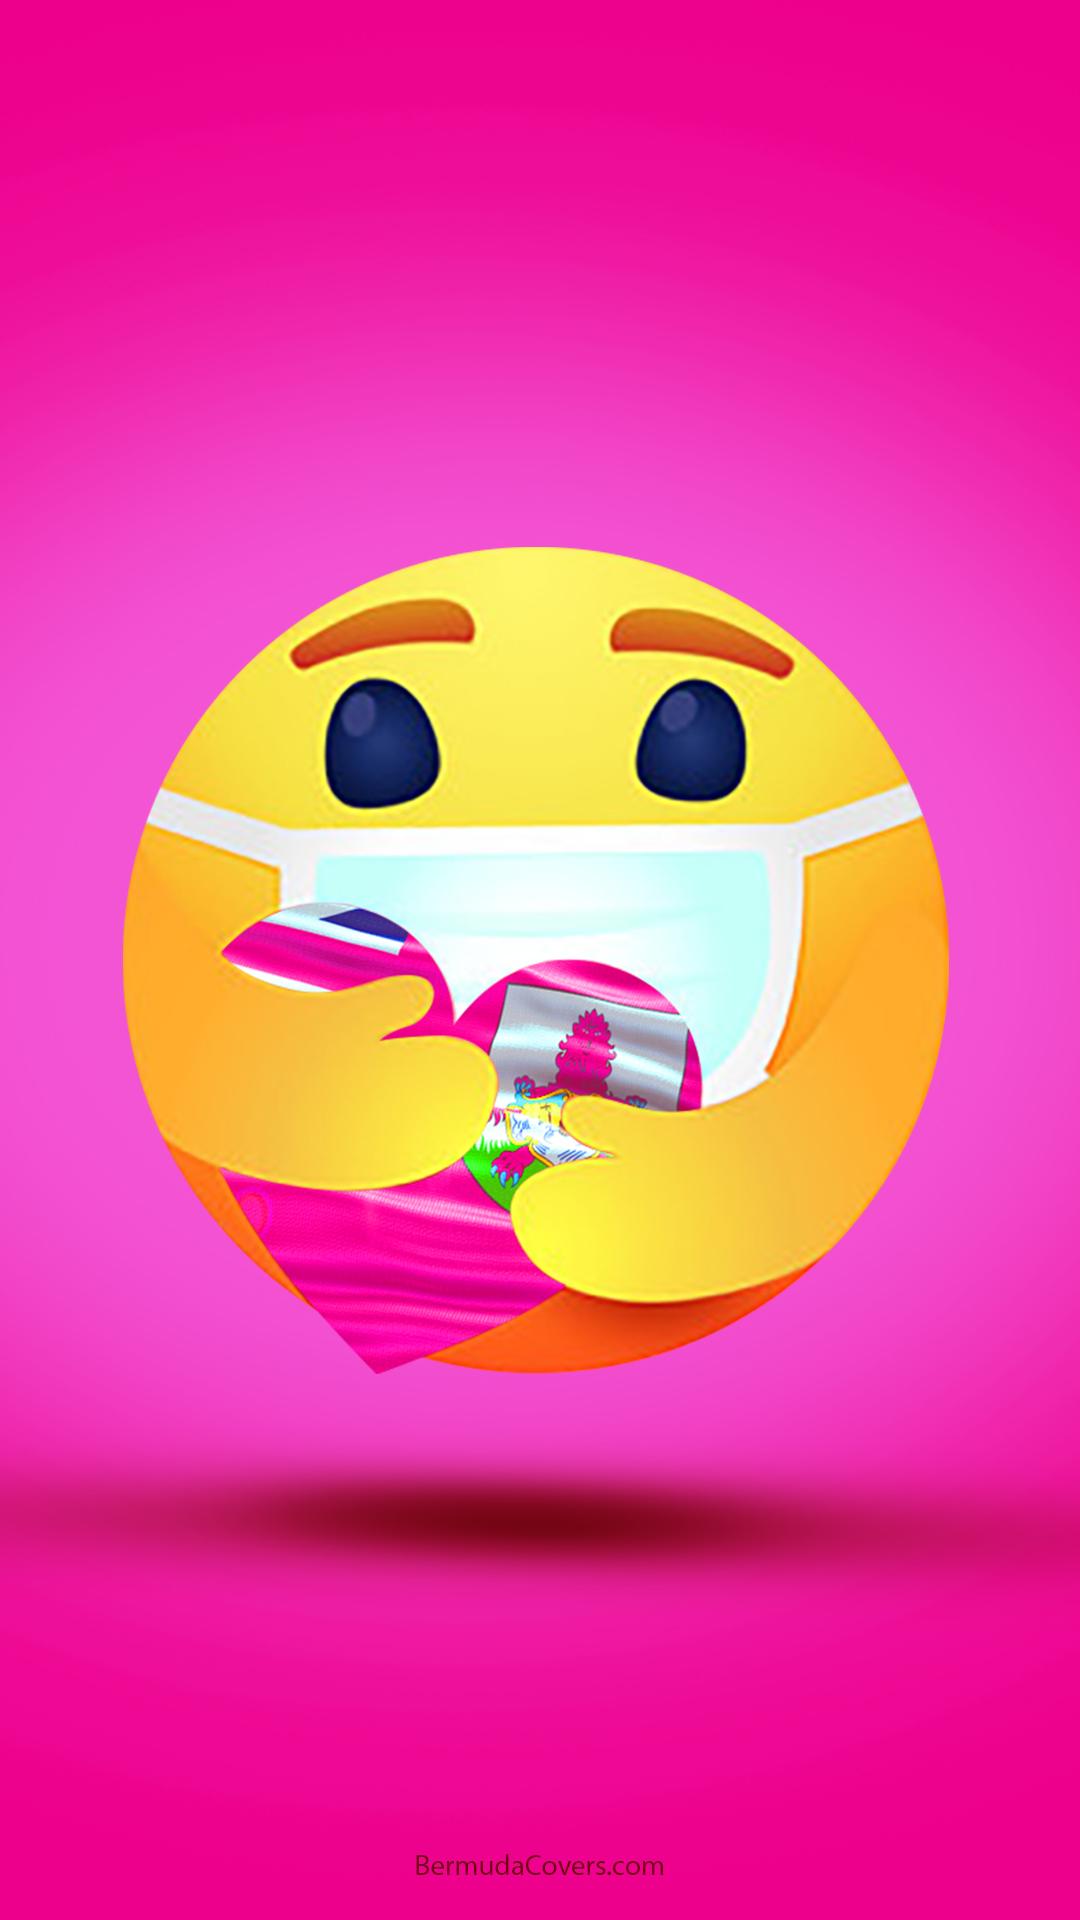 Emoji Heart Hug Mask Bermuda Bernews Mobile phone wallpaper lock screen design image photo YyDNzgkN